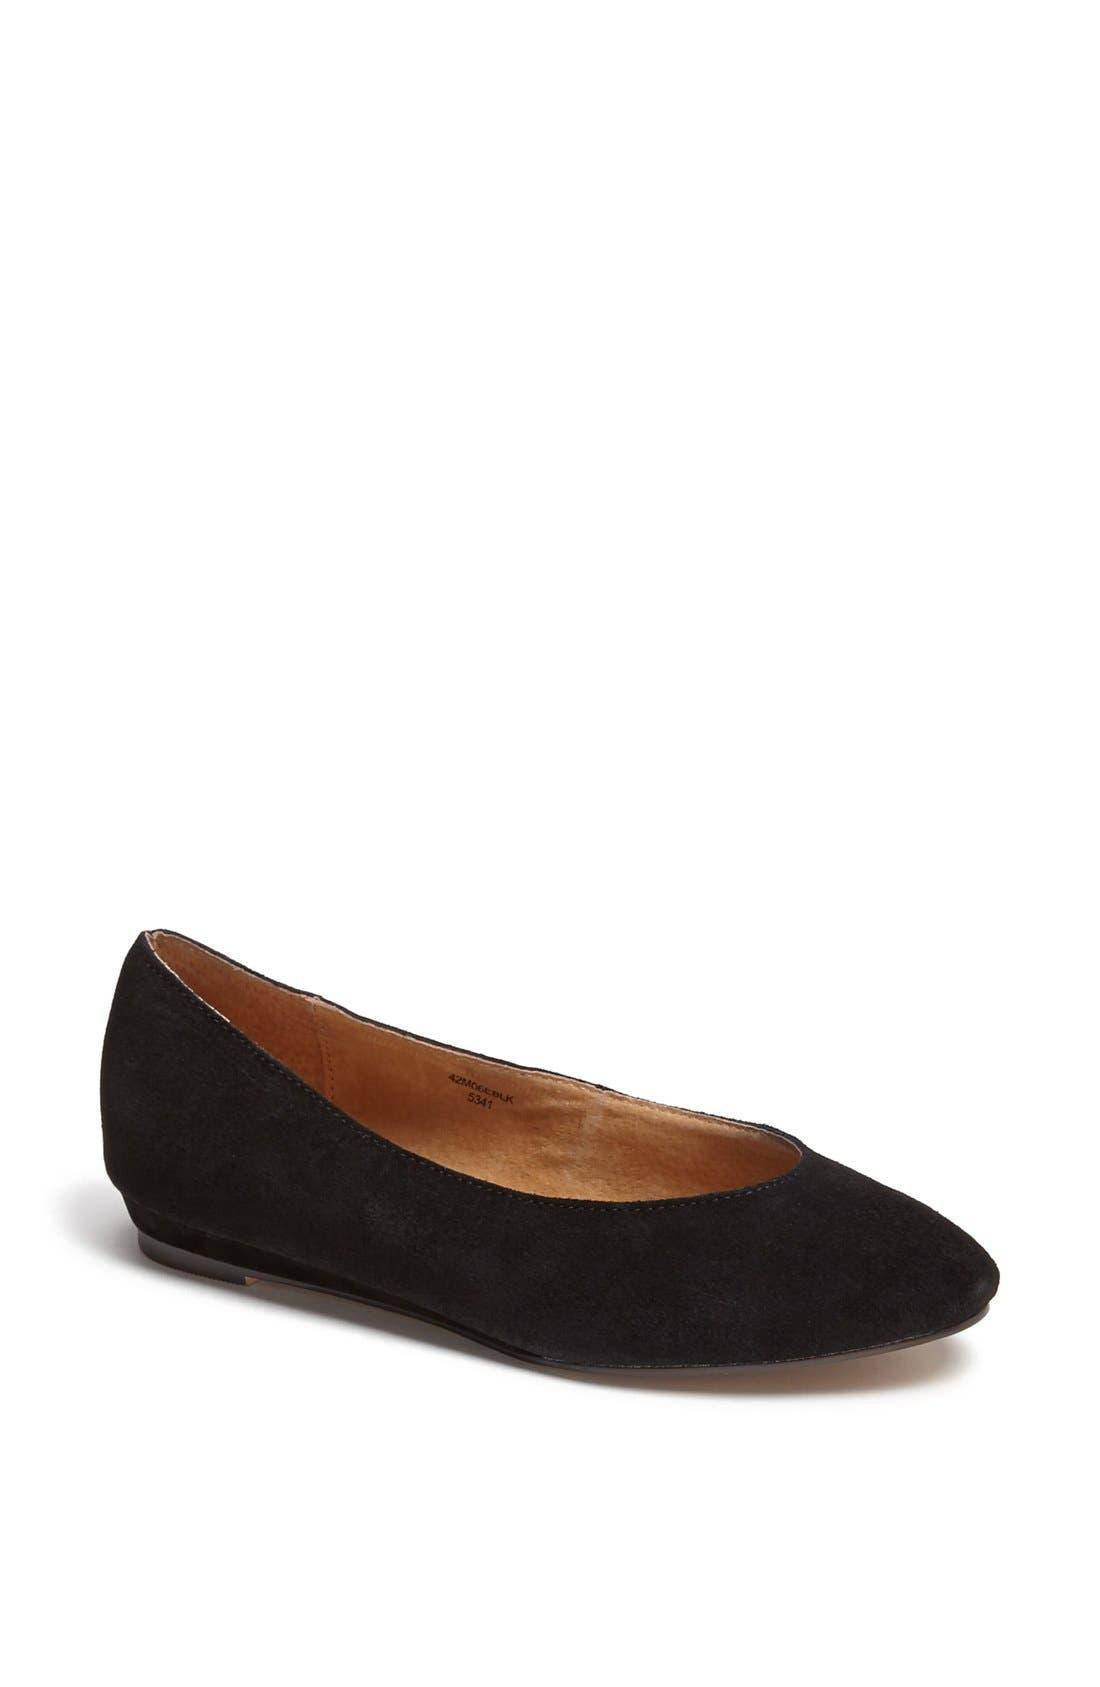 Main Image - Topshop 'Mello Mini Wedge' Court Shoe